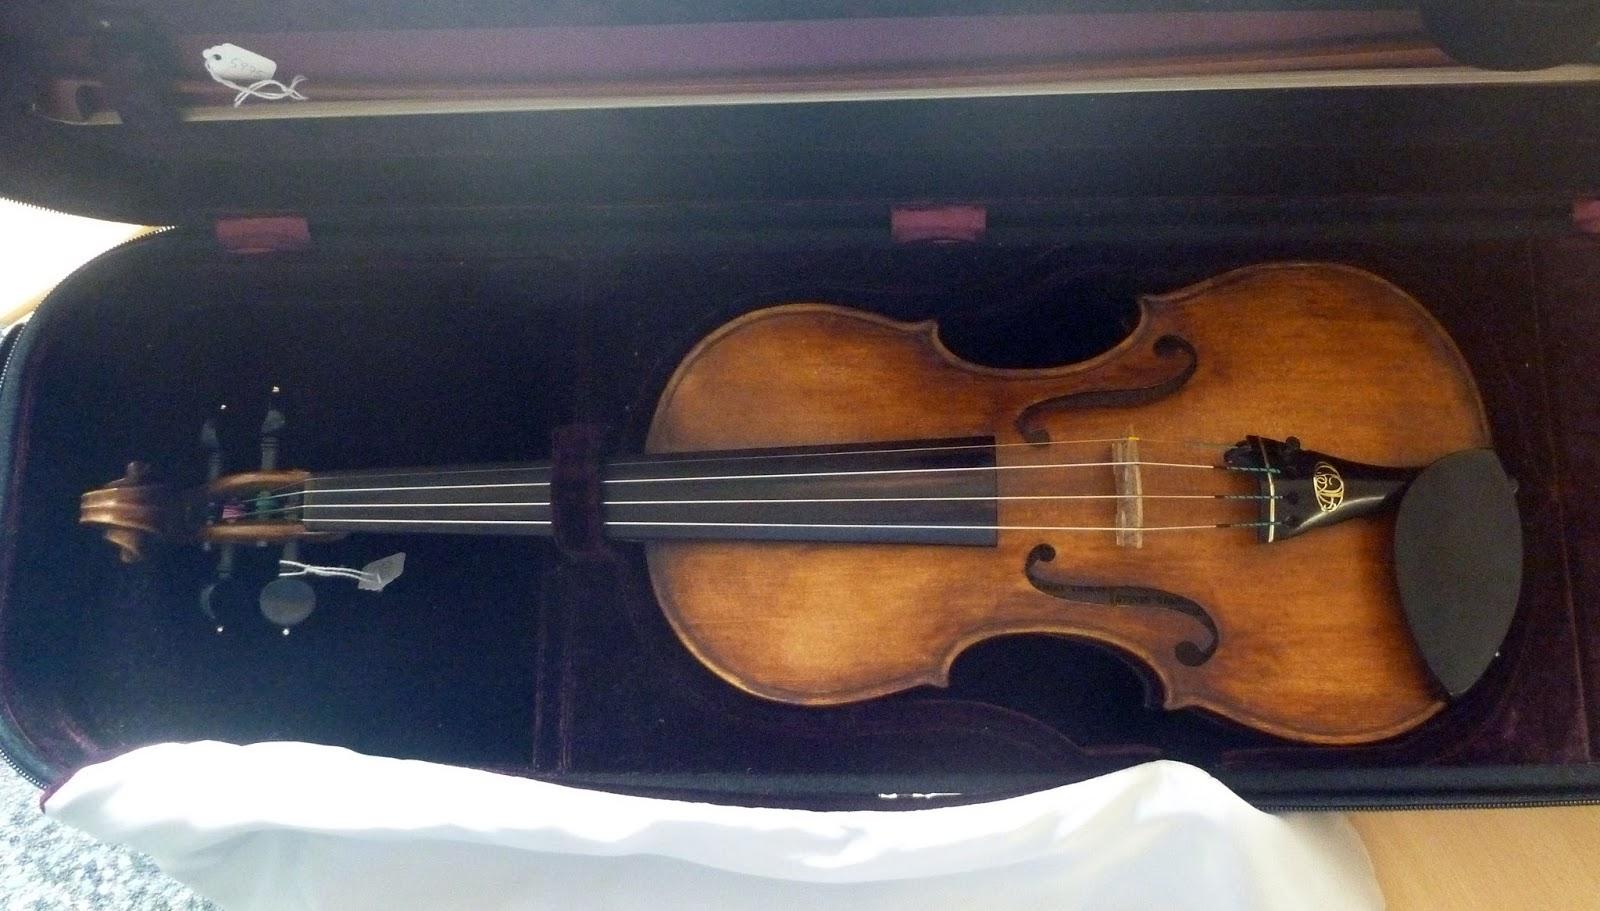 the sherlock violin i hear of sherlock everywhere